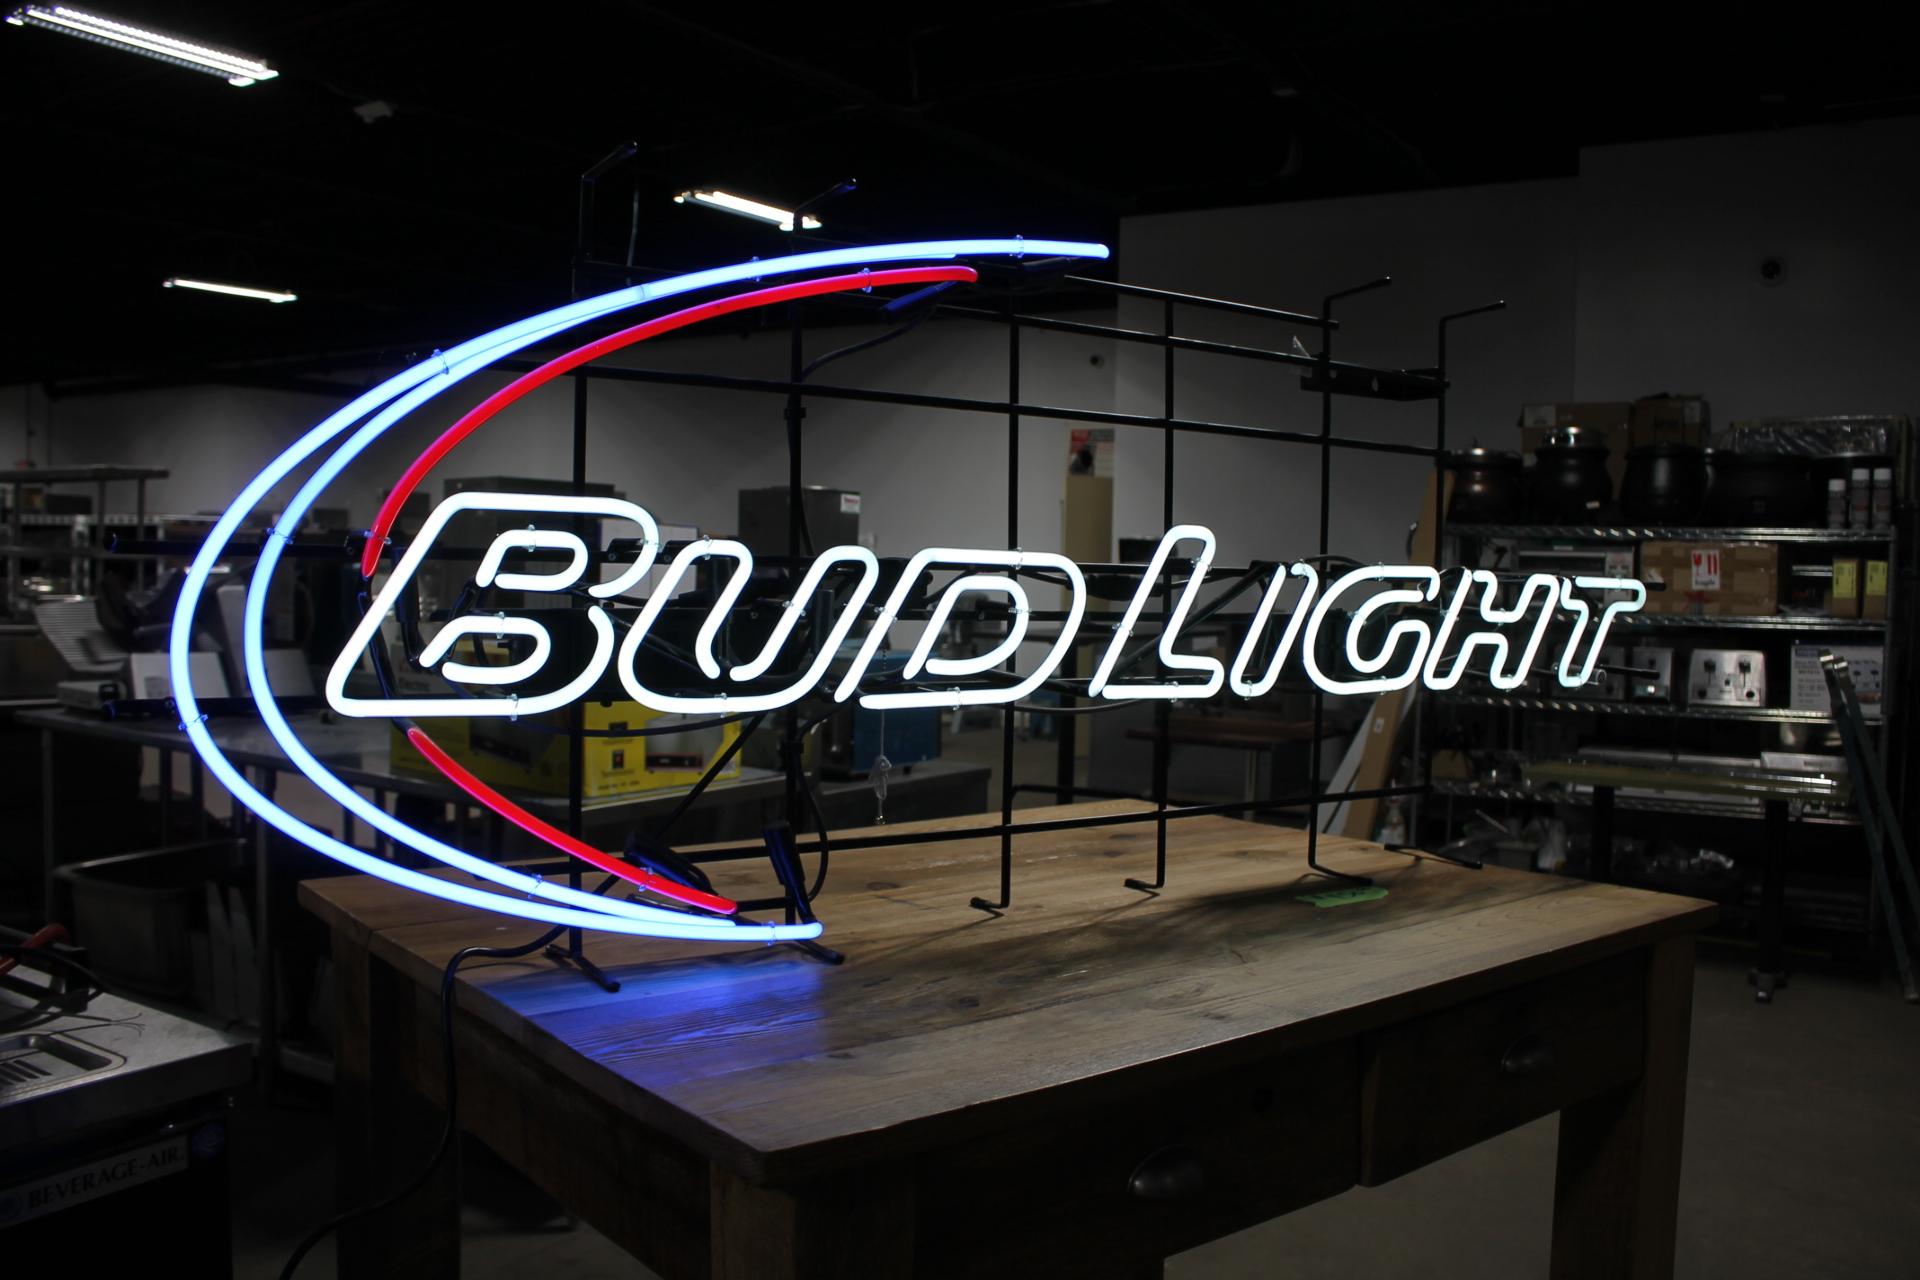 BUD LIGHT Lrg Neon Sign